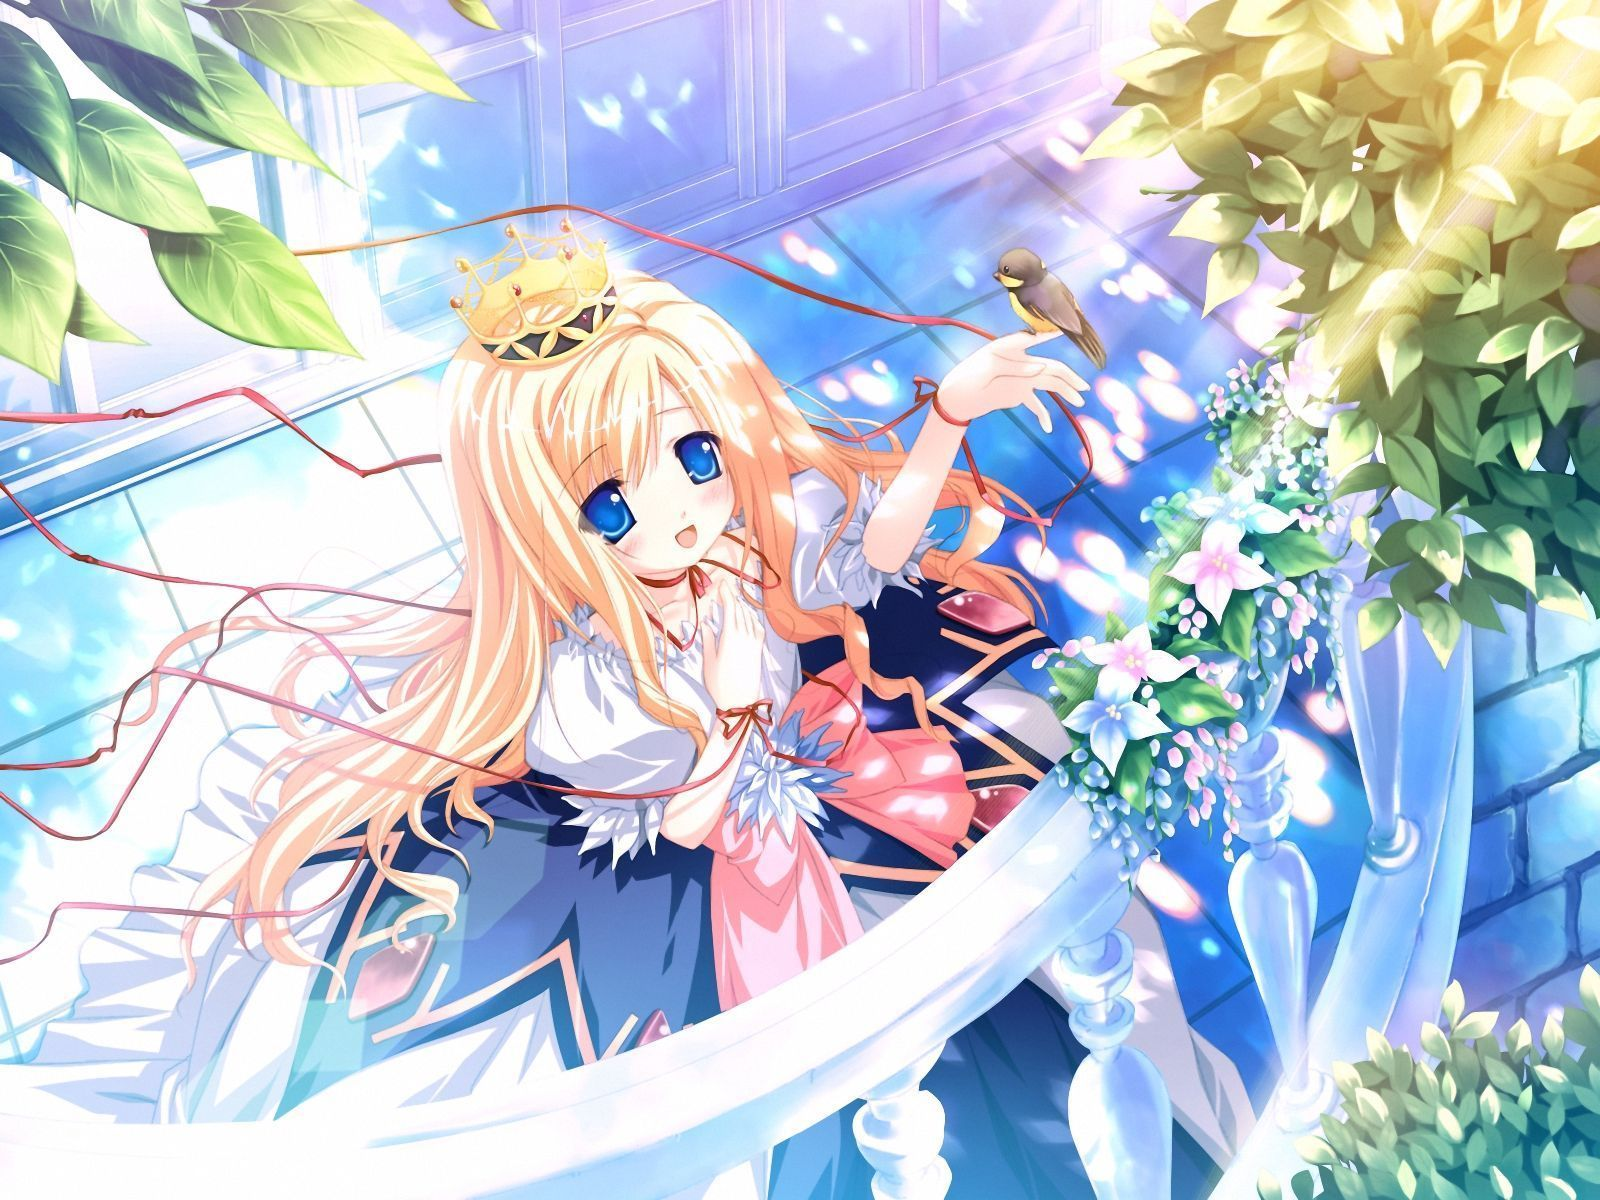 Fond d 39 cran manga - Manga princesse ...